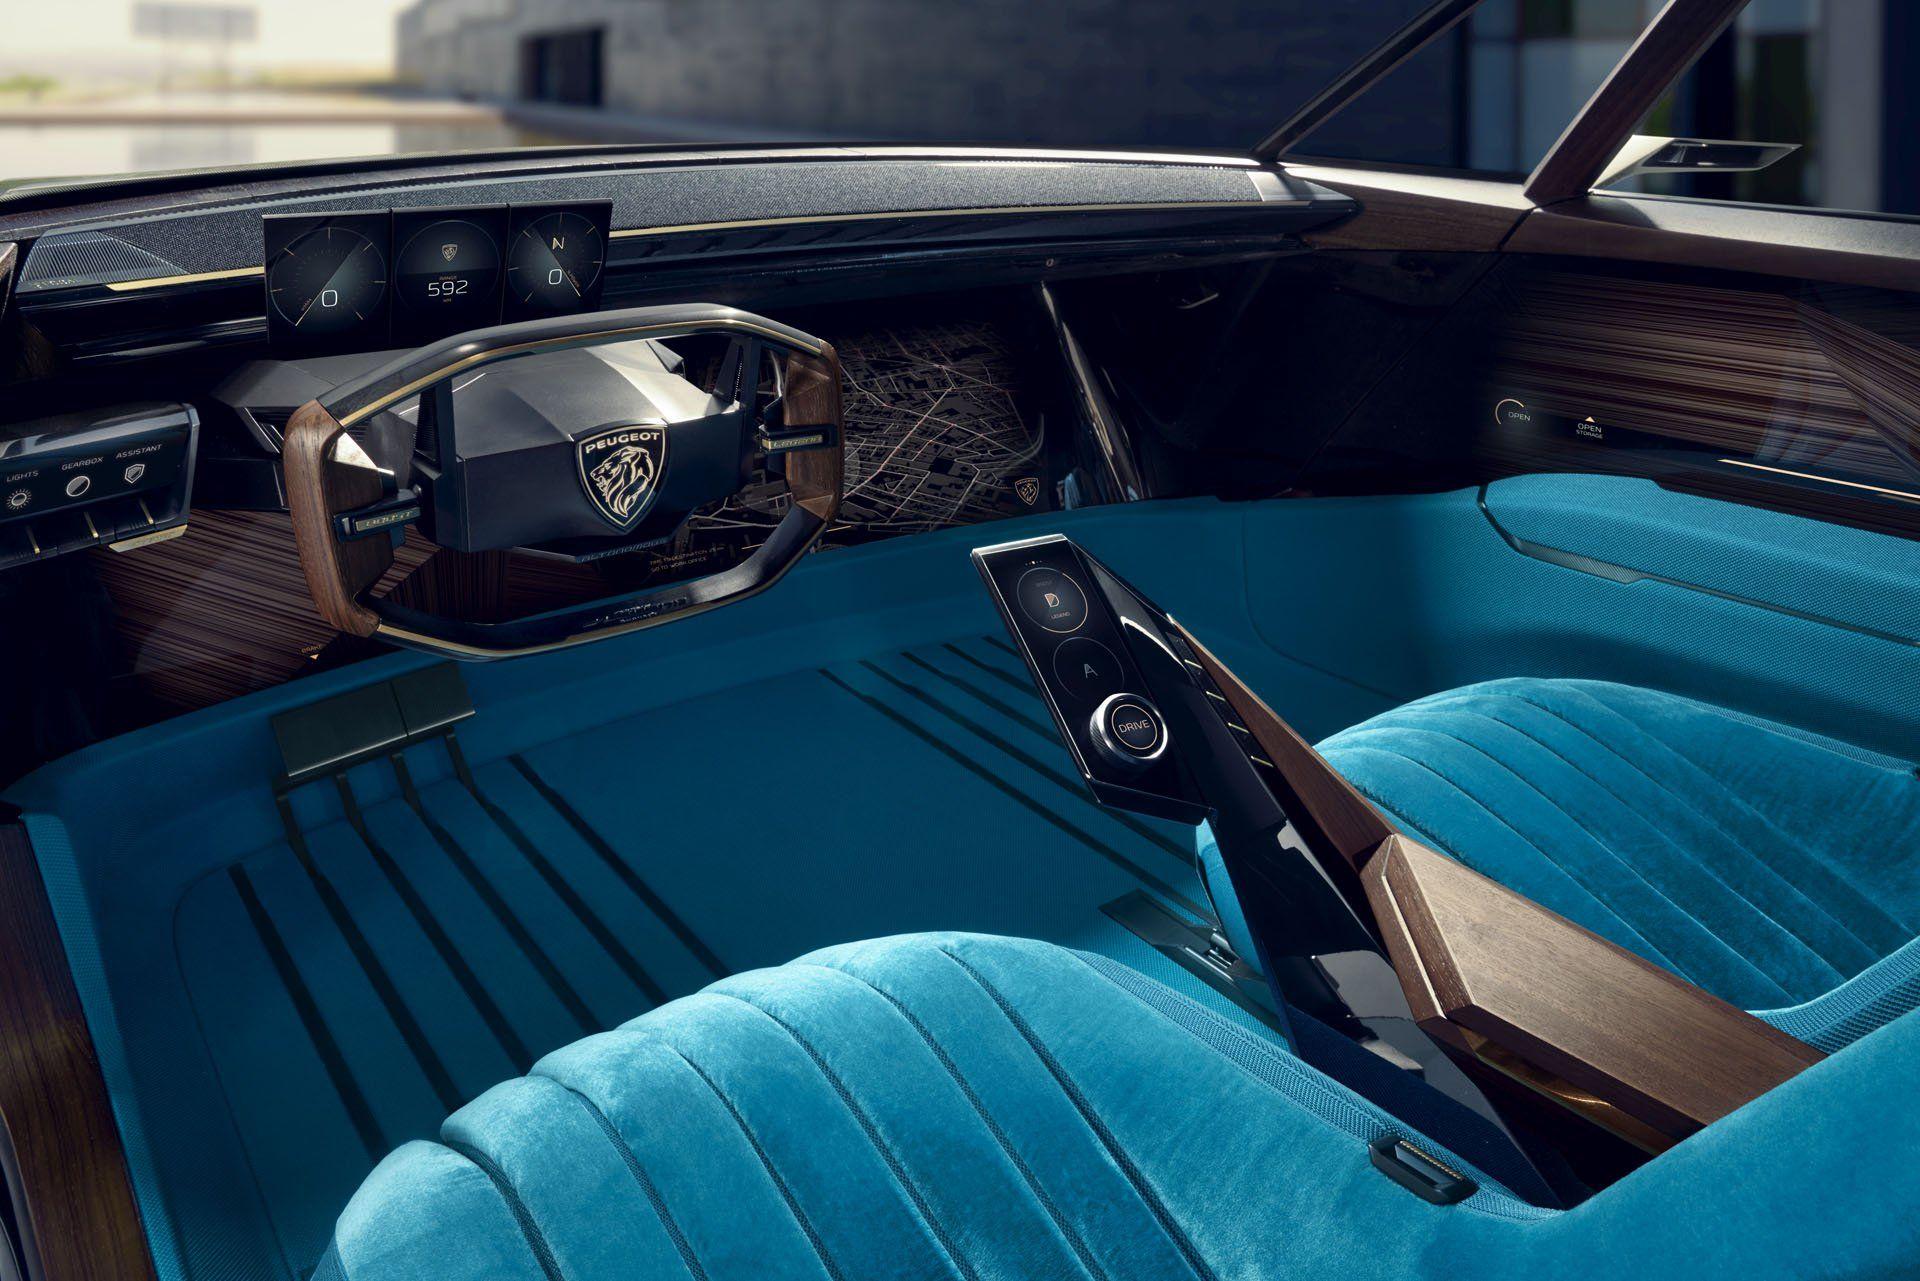 Peugeot eLegend Concept Takes Retro Design Into The